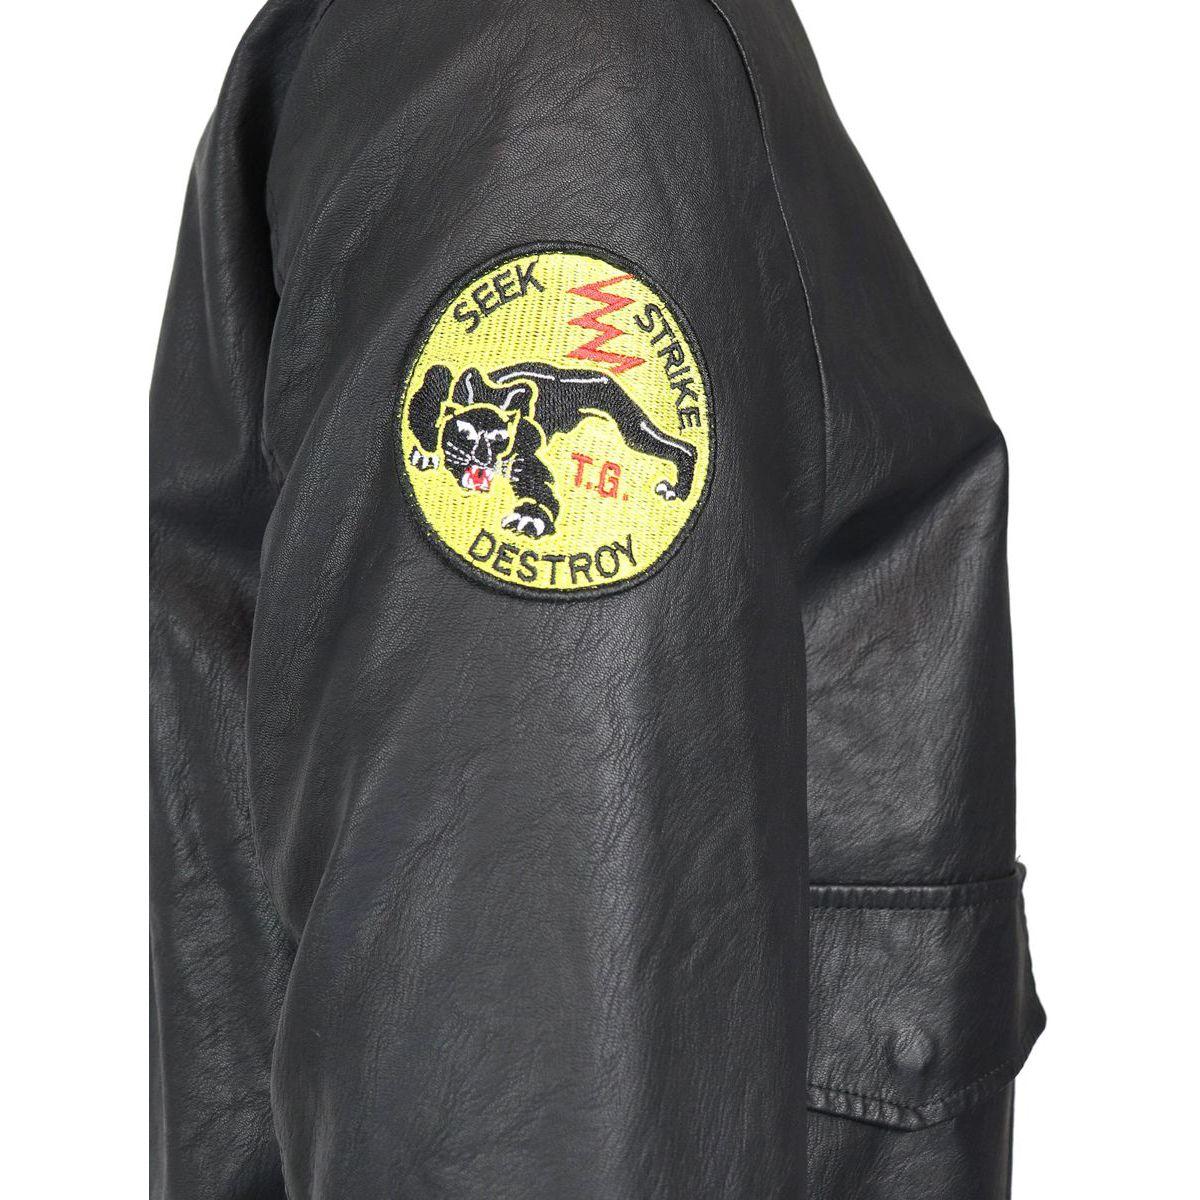 Kansas Bomber with patch applications Black Top Gun